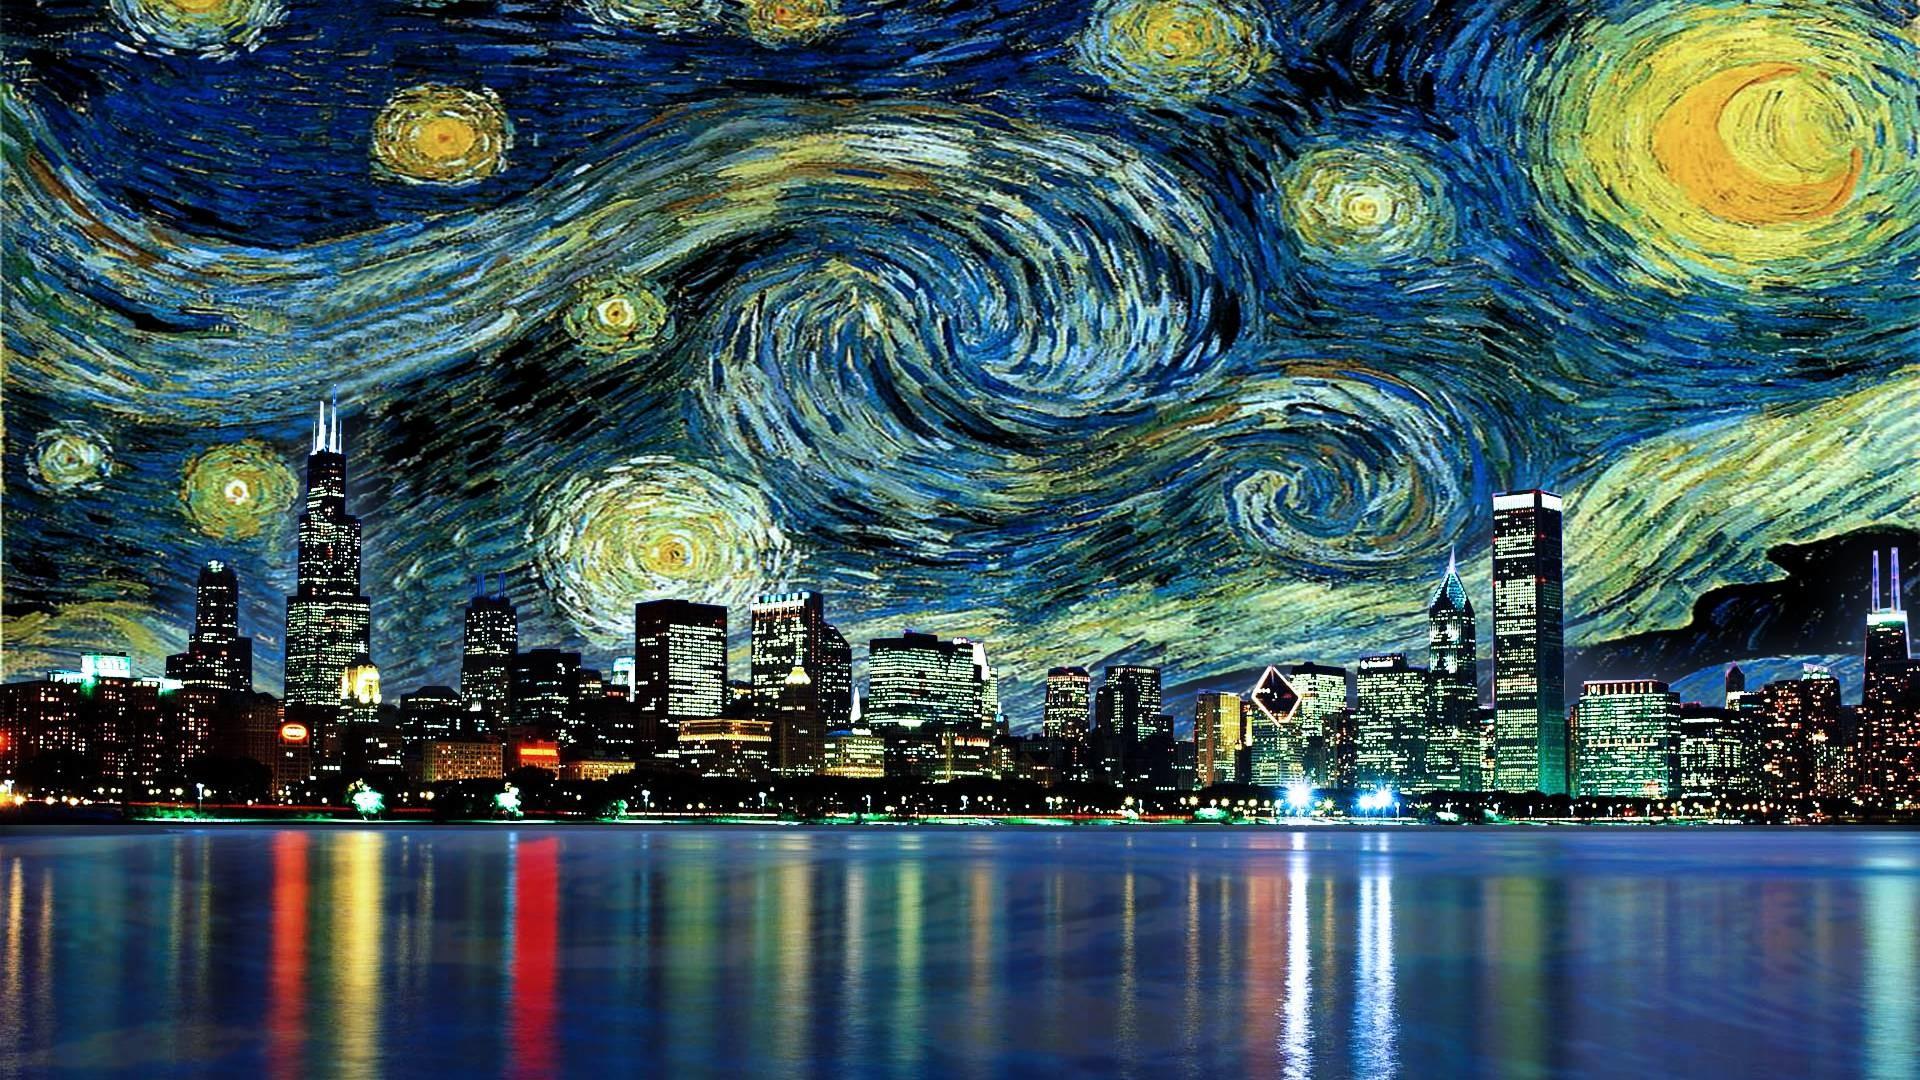 starry night background 56